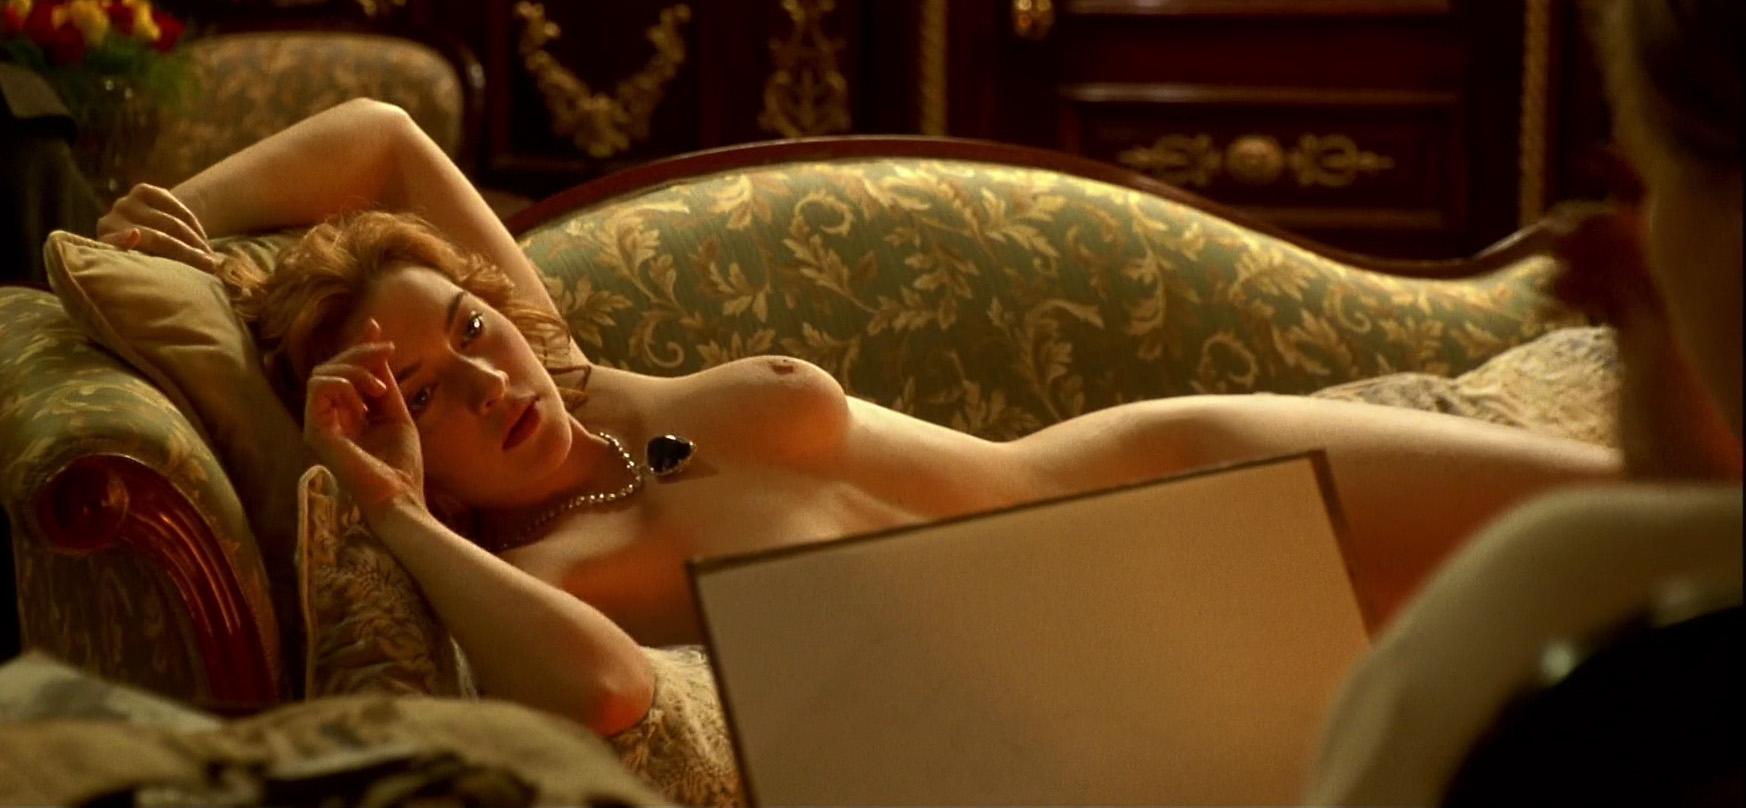 Titanic Rose Sketch Nude Drawing Hope Diamond